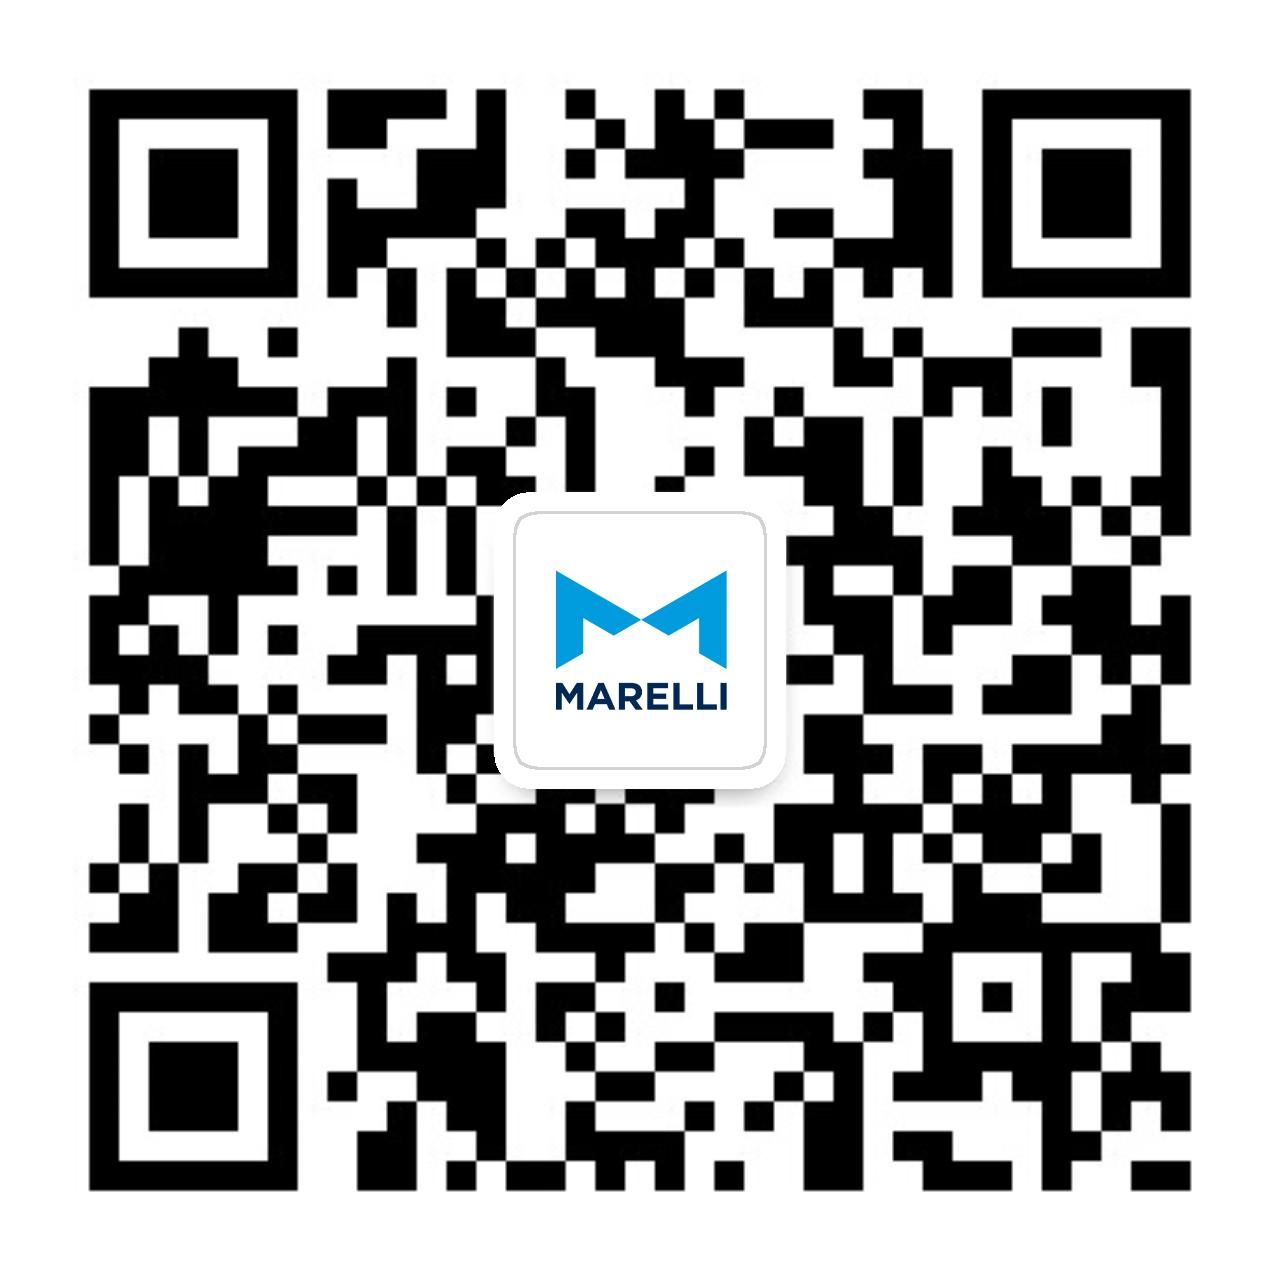 MARELLI WeChat QR Code